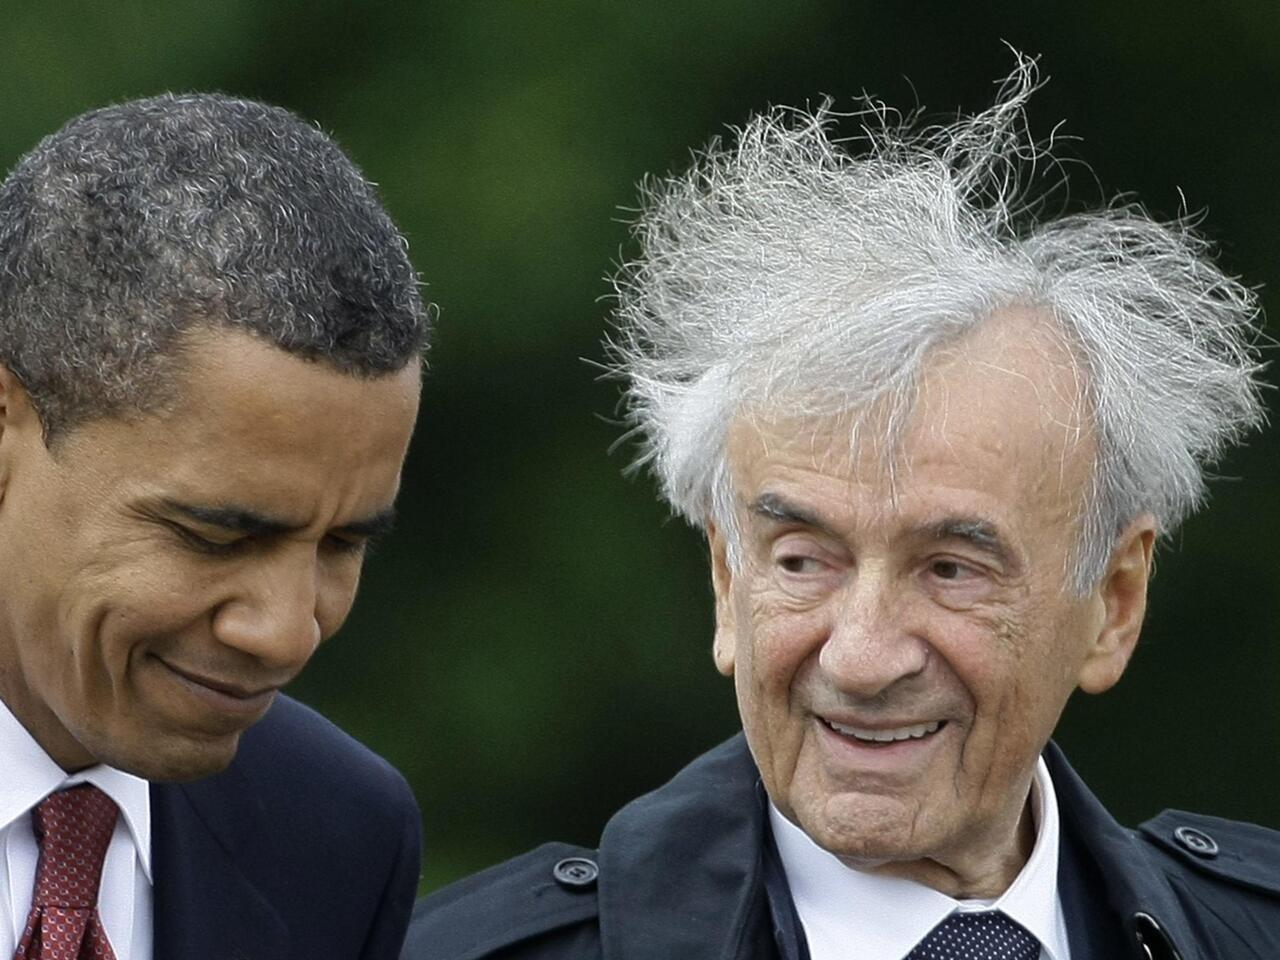 Hollande pays tribute to Nobel winning holocaust survivor Elie Wiesel